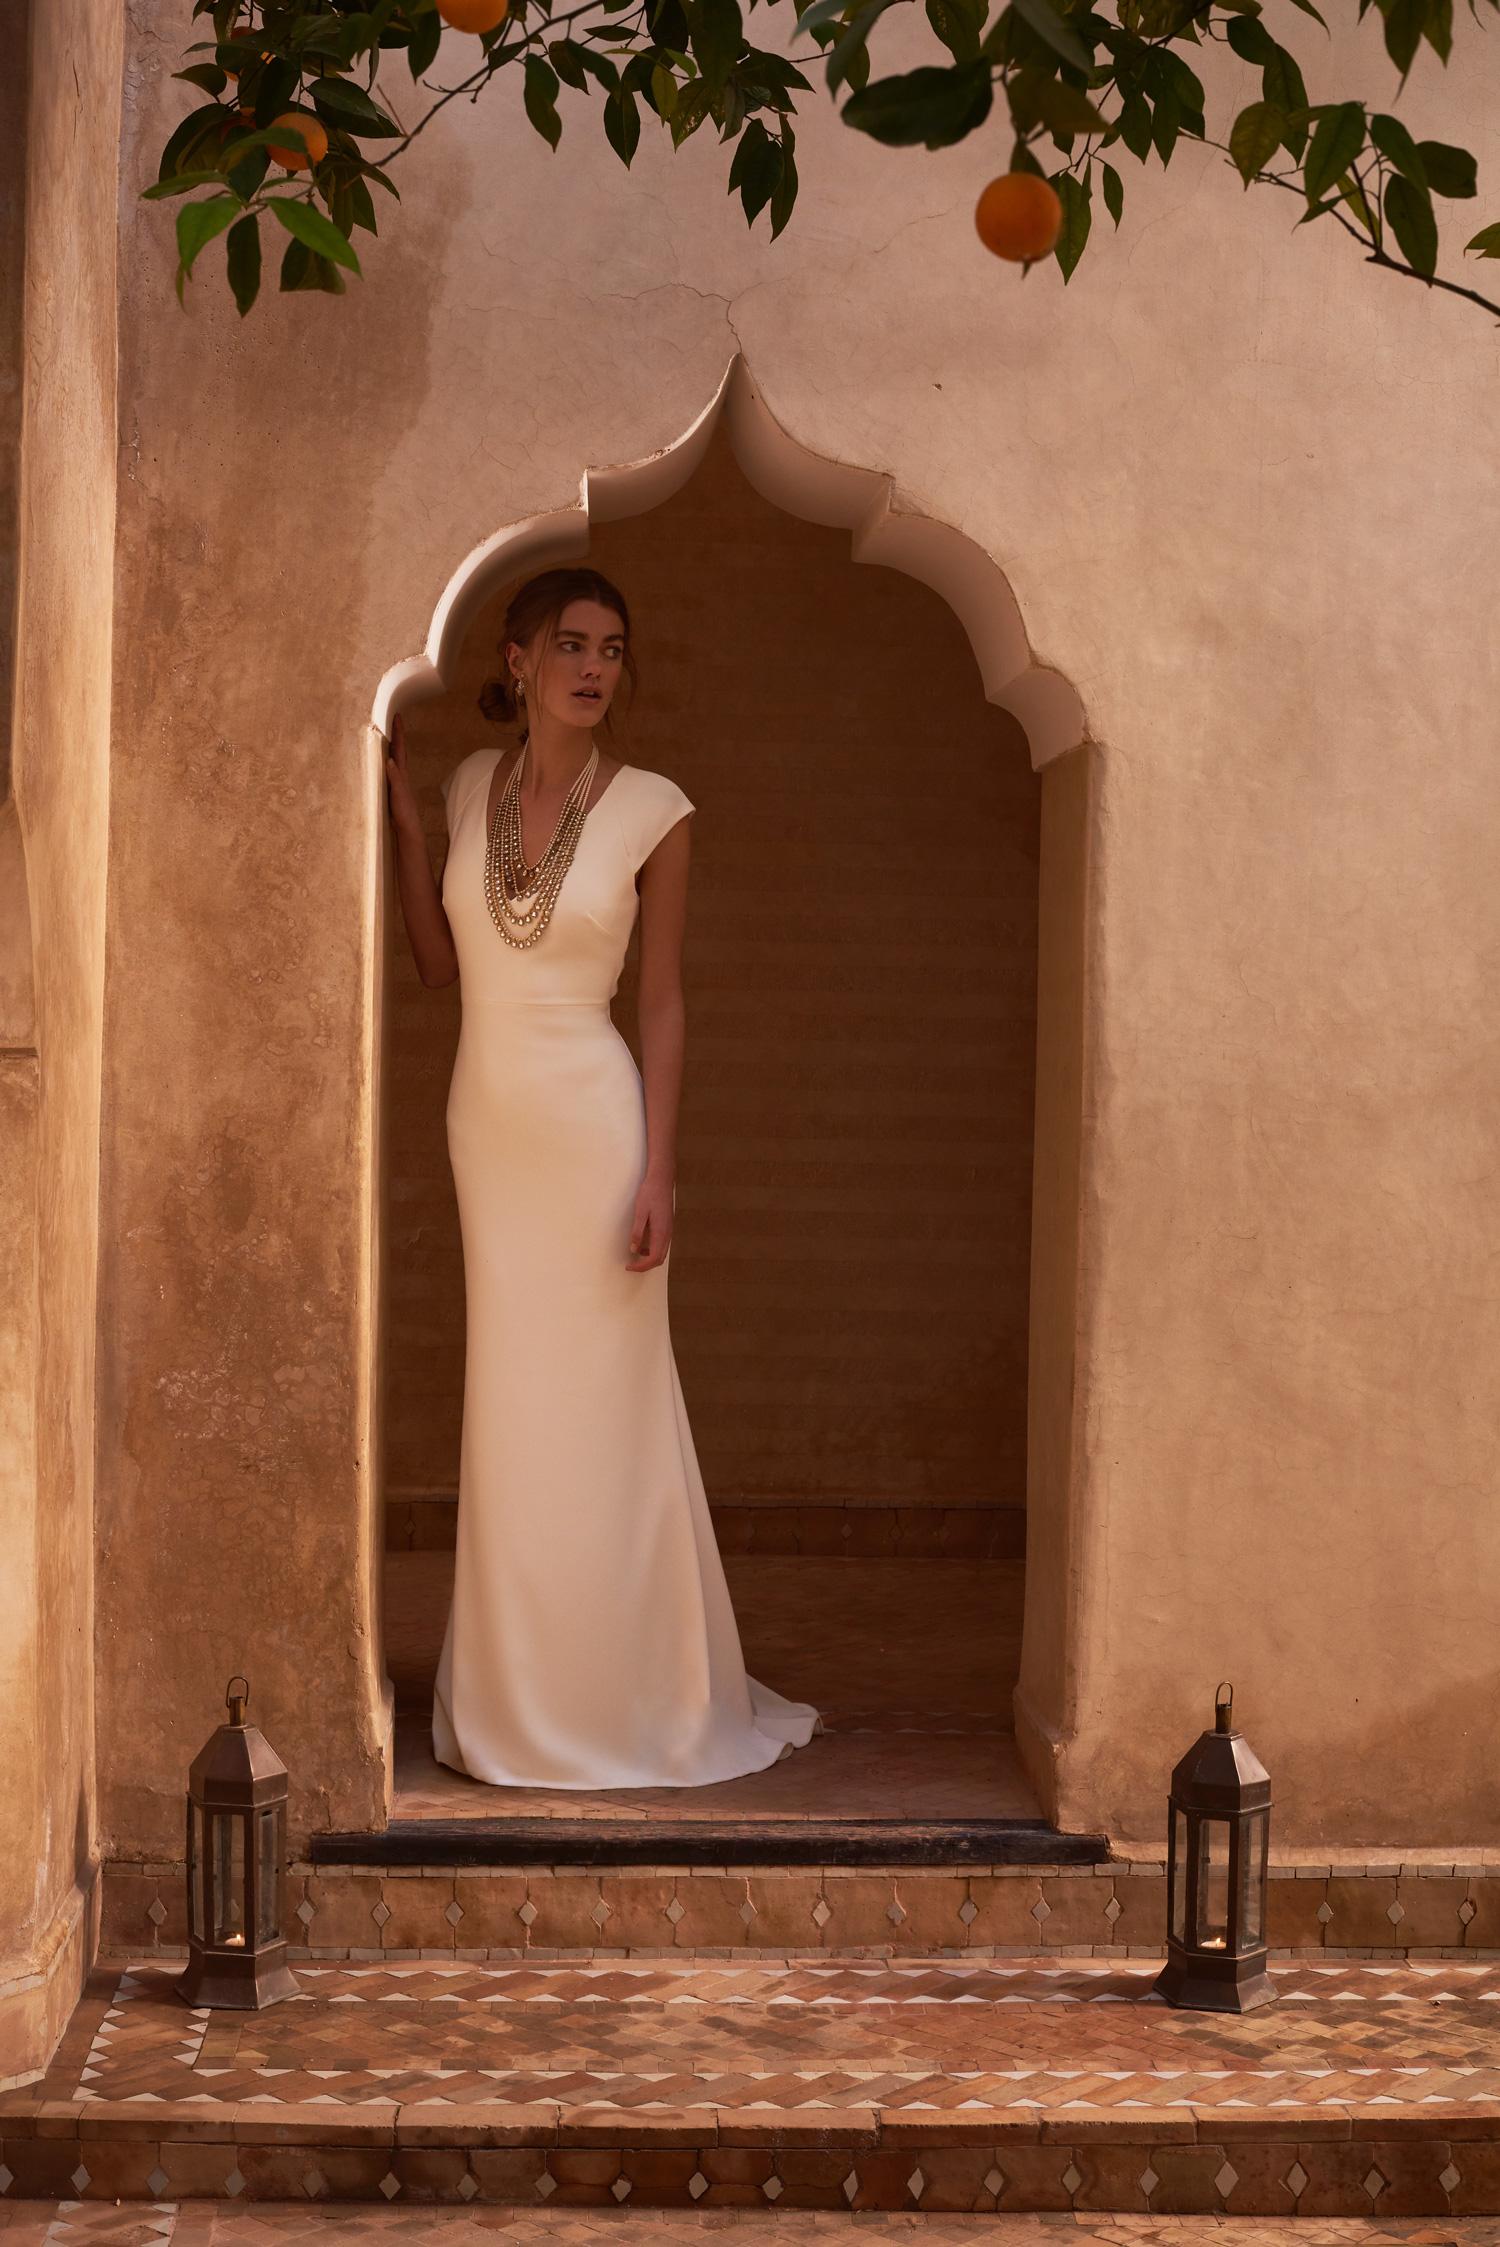 Sawyer V neck wedding dress in white crepe material Badgley Mischka for BHLDN boho chic